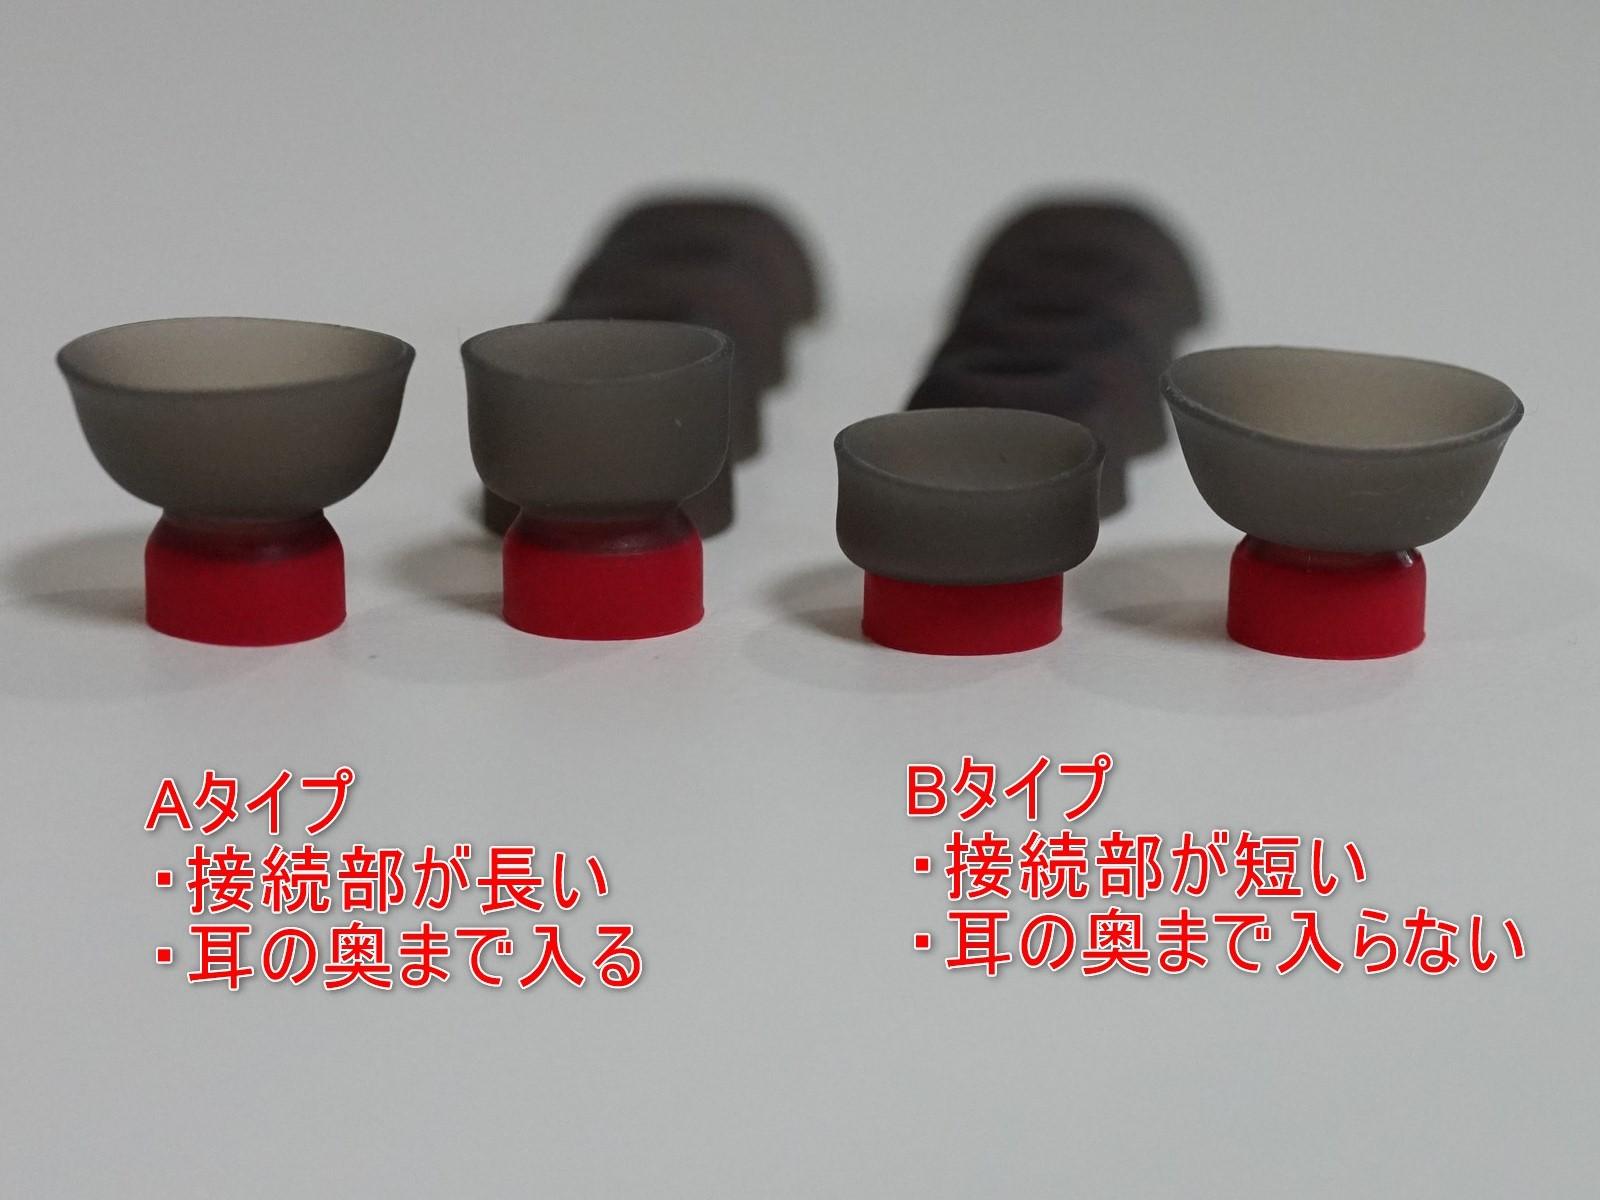 EarFun Air Pro 2のイヤーピースは2種×3サイズ、他社製とも互換性があり交換可能